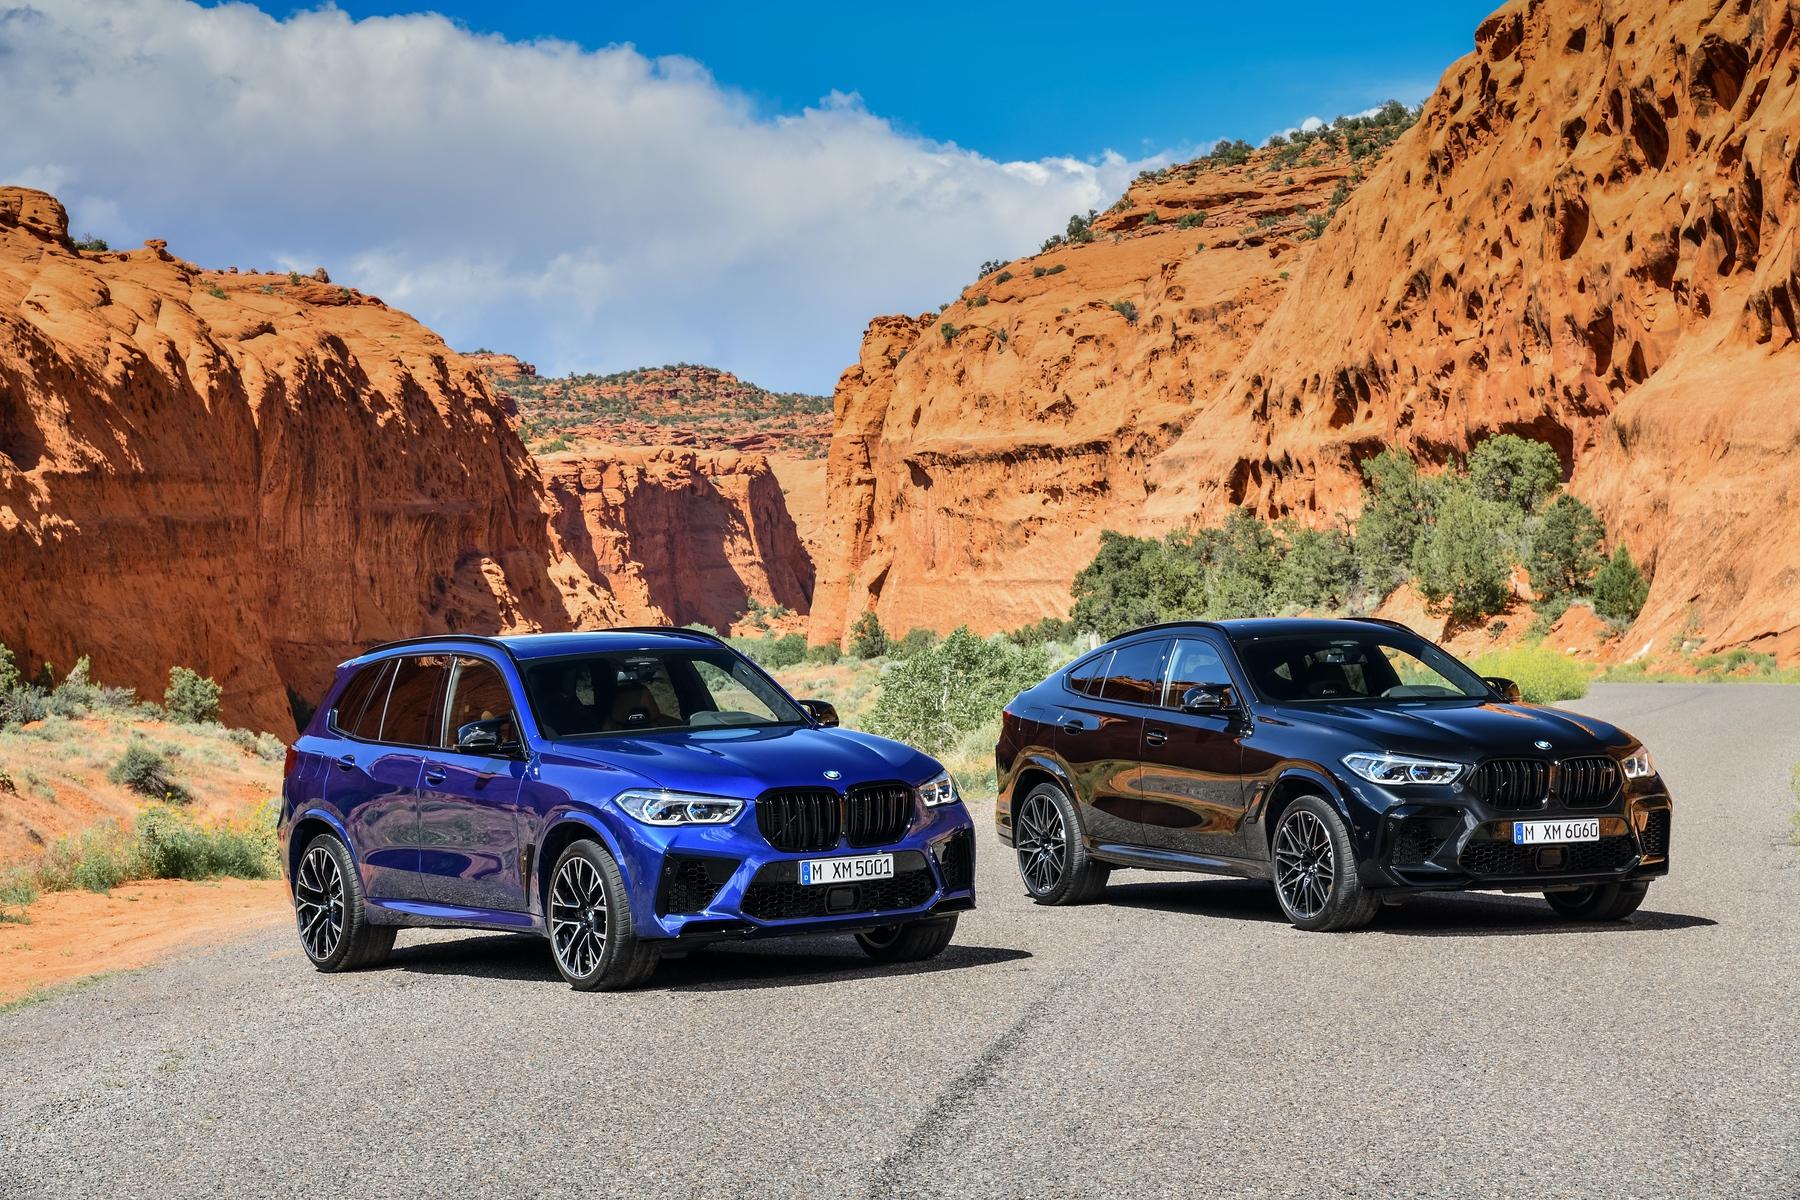 World Premier 2020 Bmw X5 M And X6 M Bimmerfile